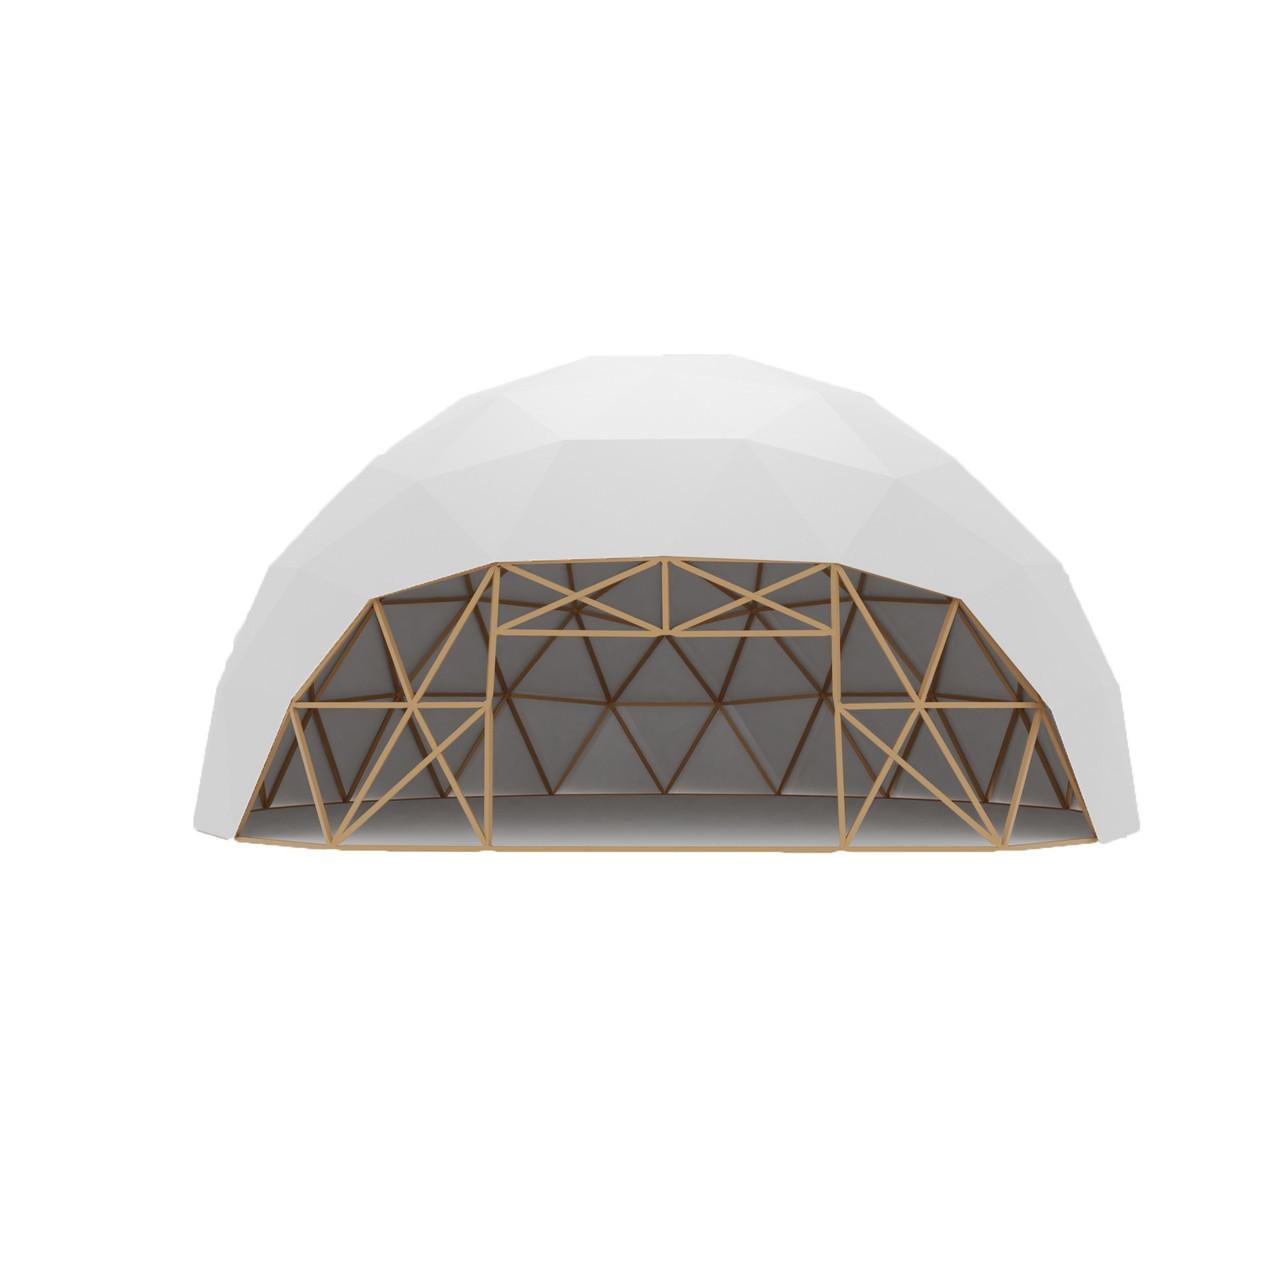 Сферический шатер диаметр 8 м